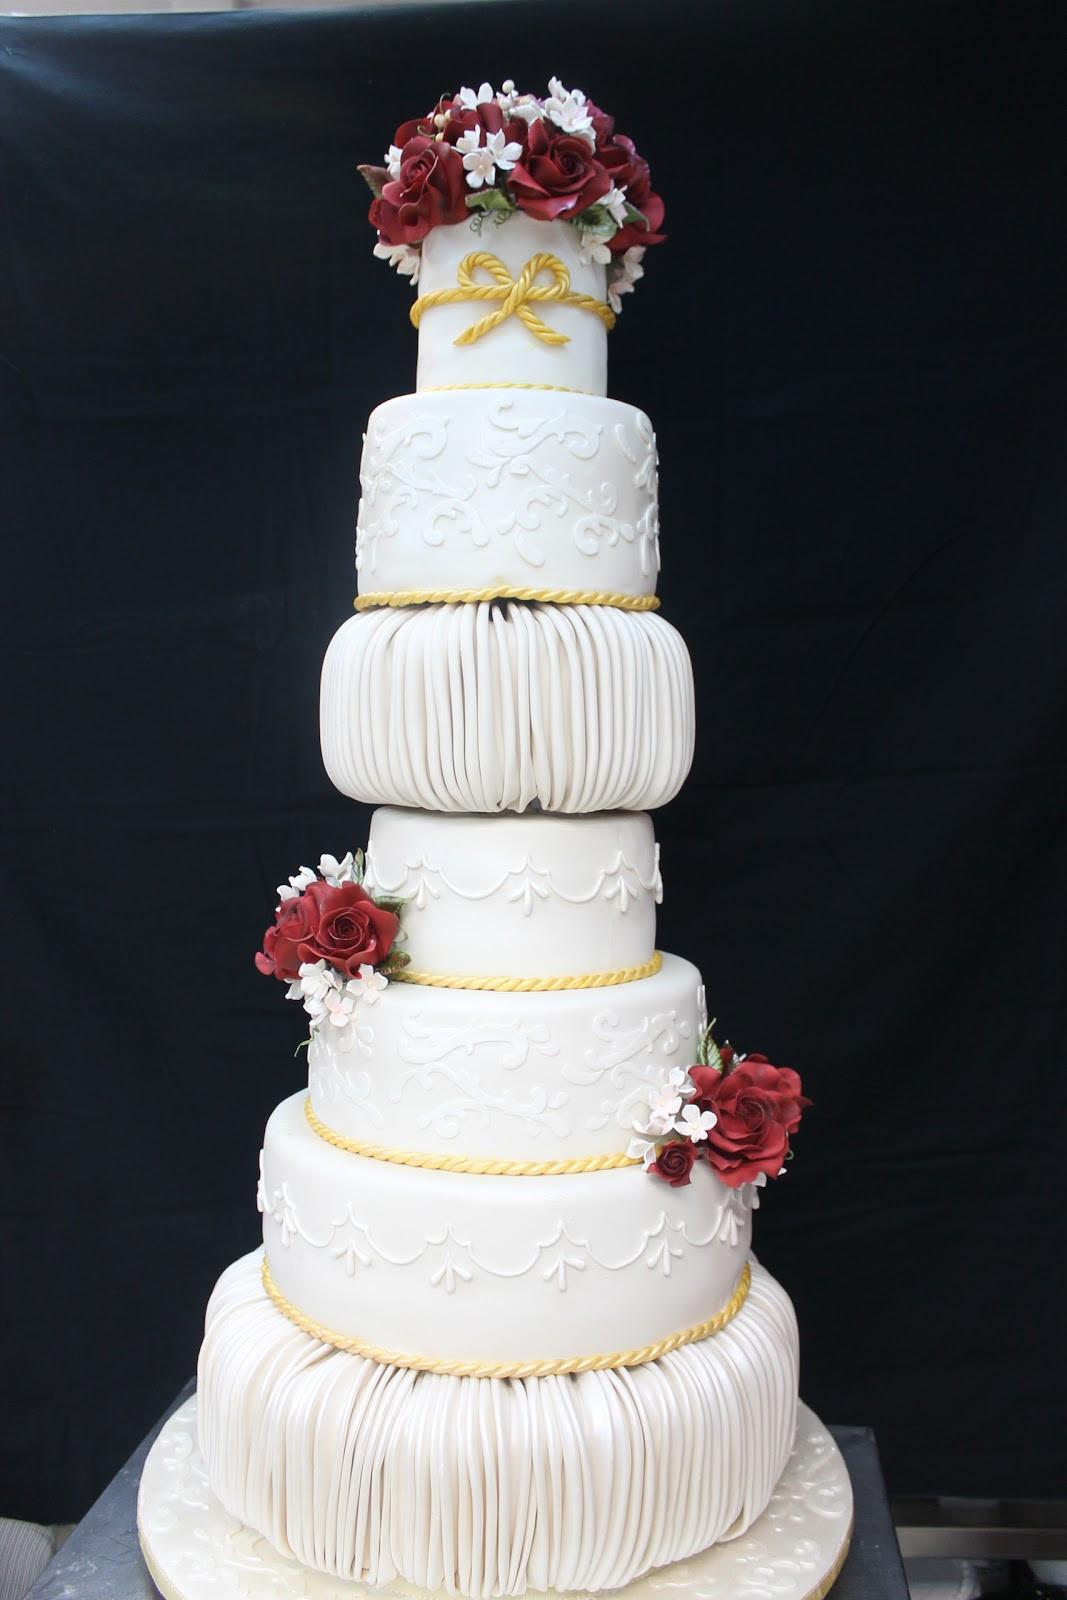 7 Tier Wedding Cakes  plete Deelite 7 tier Burgundy Rose Wedding Cake